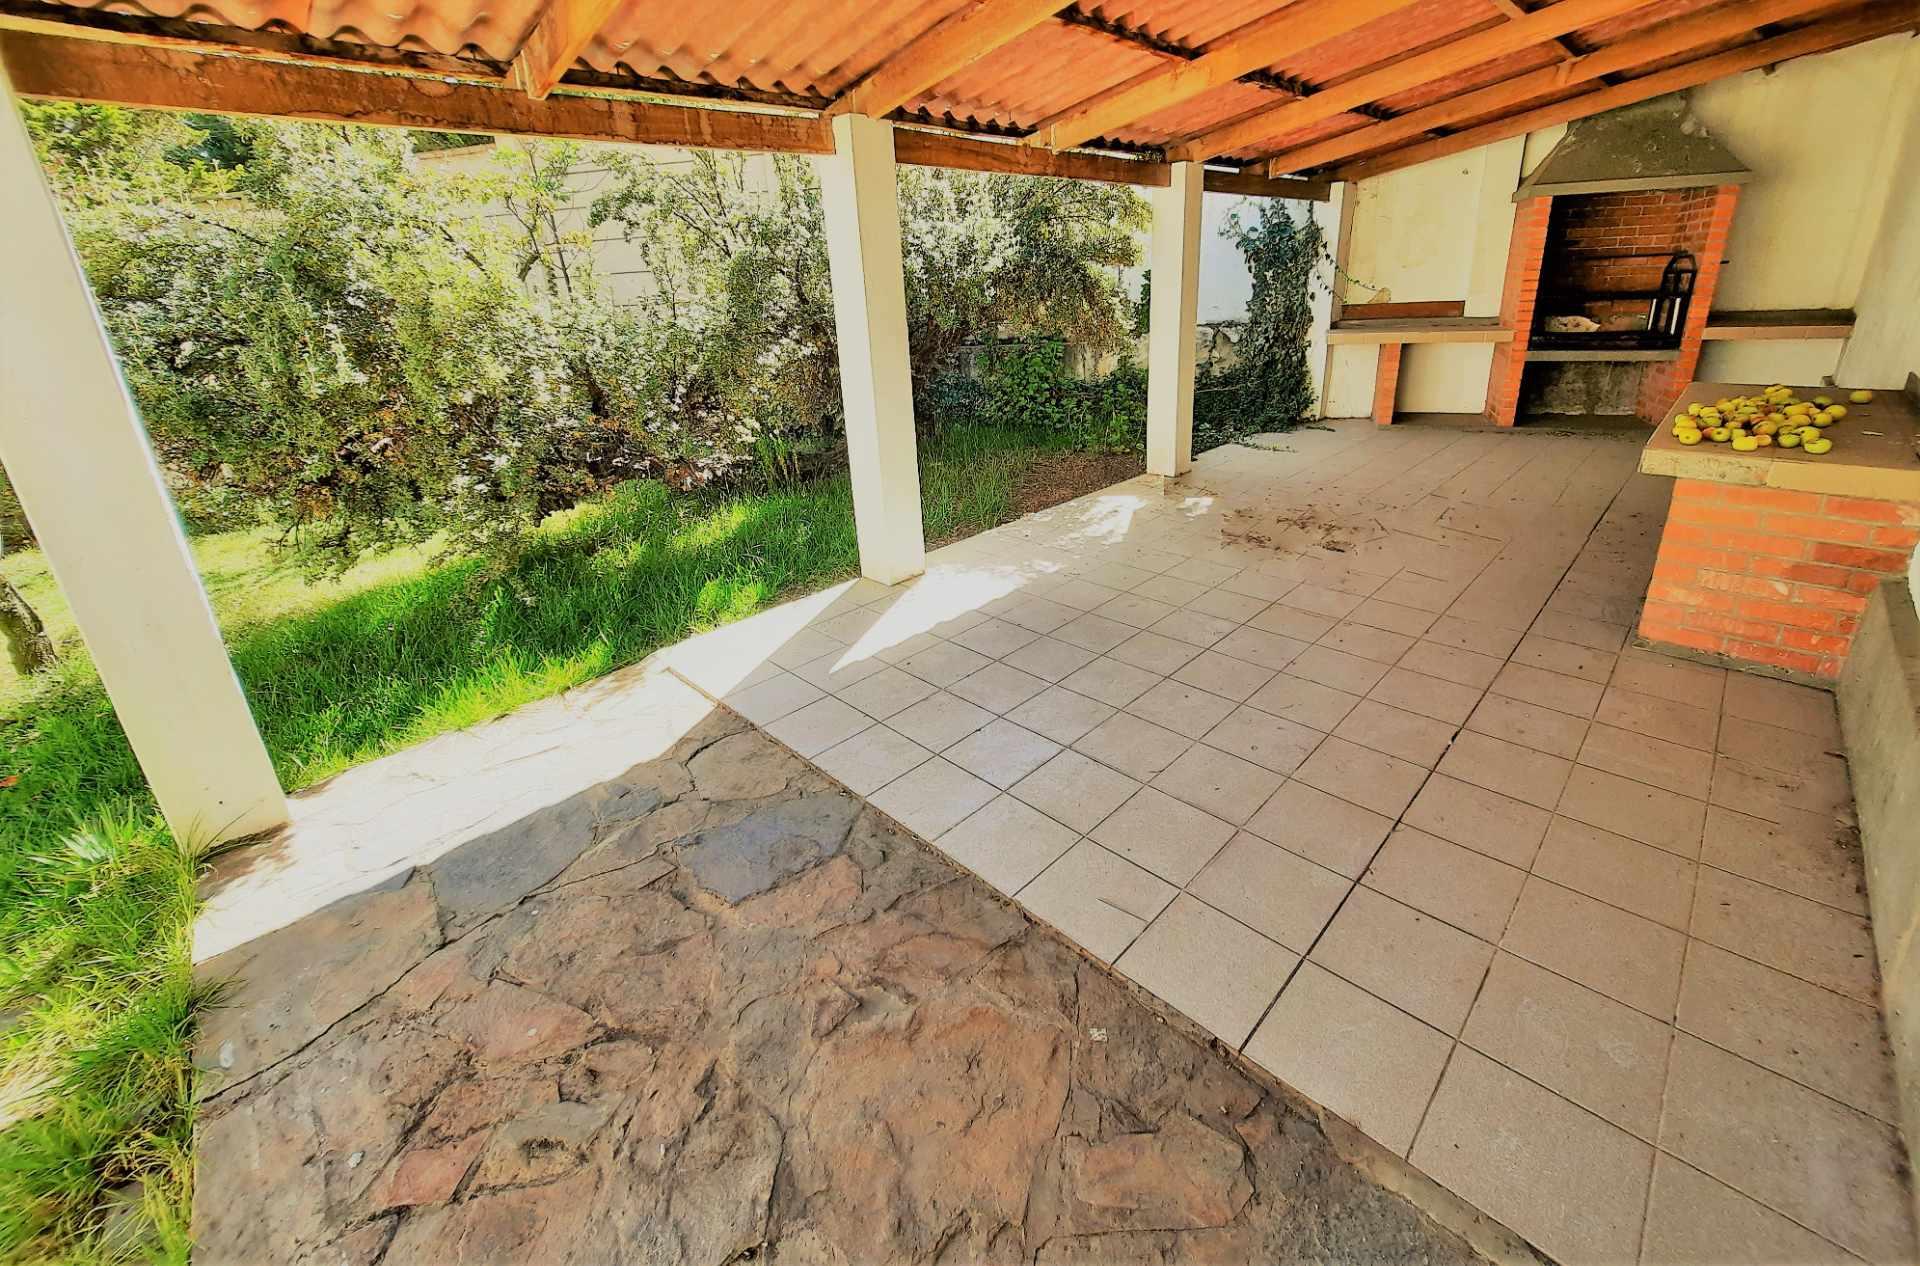 Casa en Alquiler Calle 10 de Calacoto casi esq Av. Costanera Foto 20